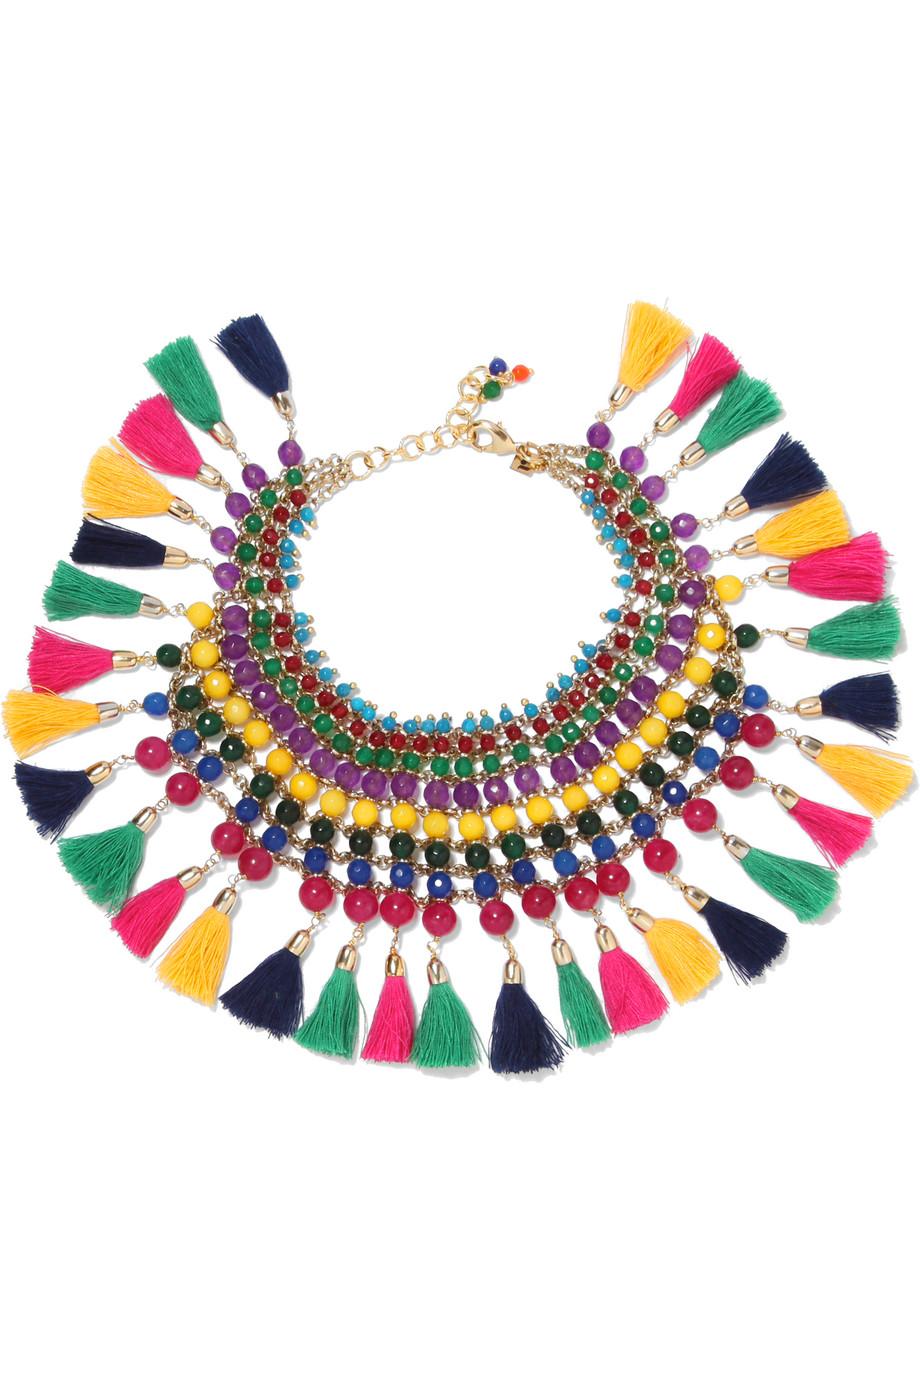 Rosantica Geranio Tasseled Gold-Tone Quartz Anklet, Green/Yellow, Women's